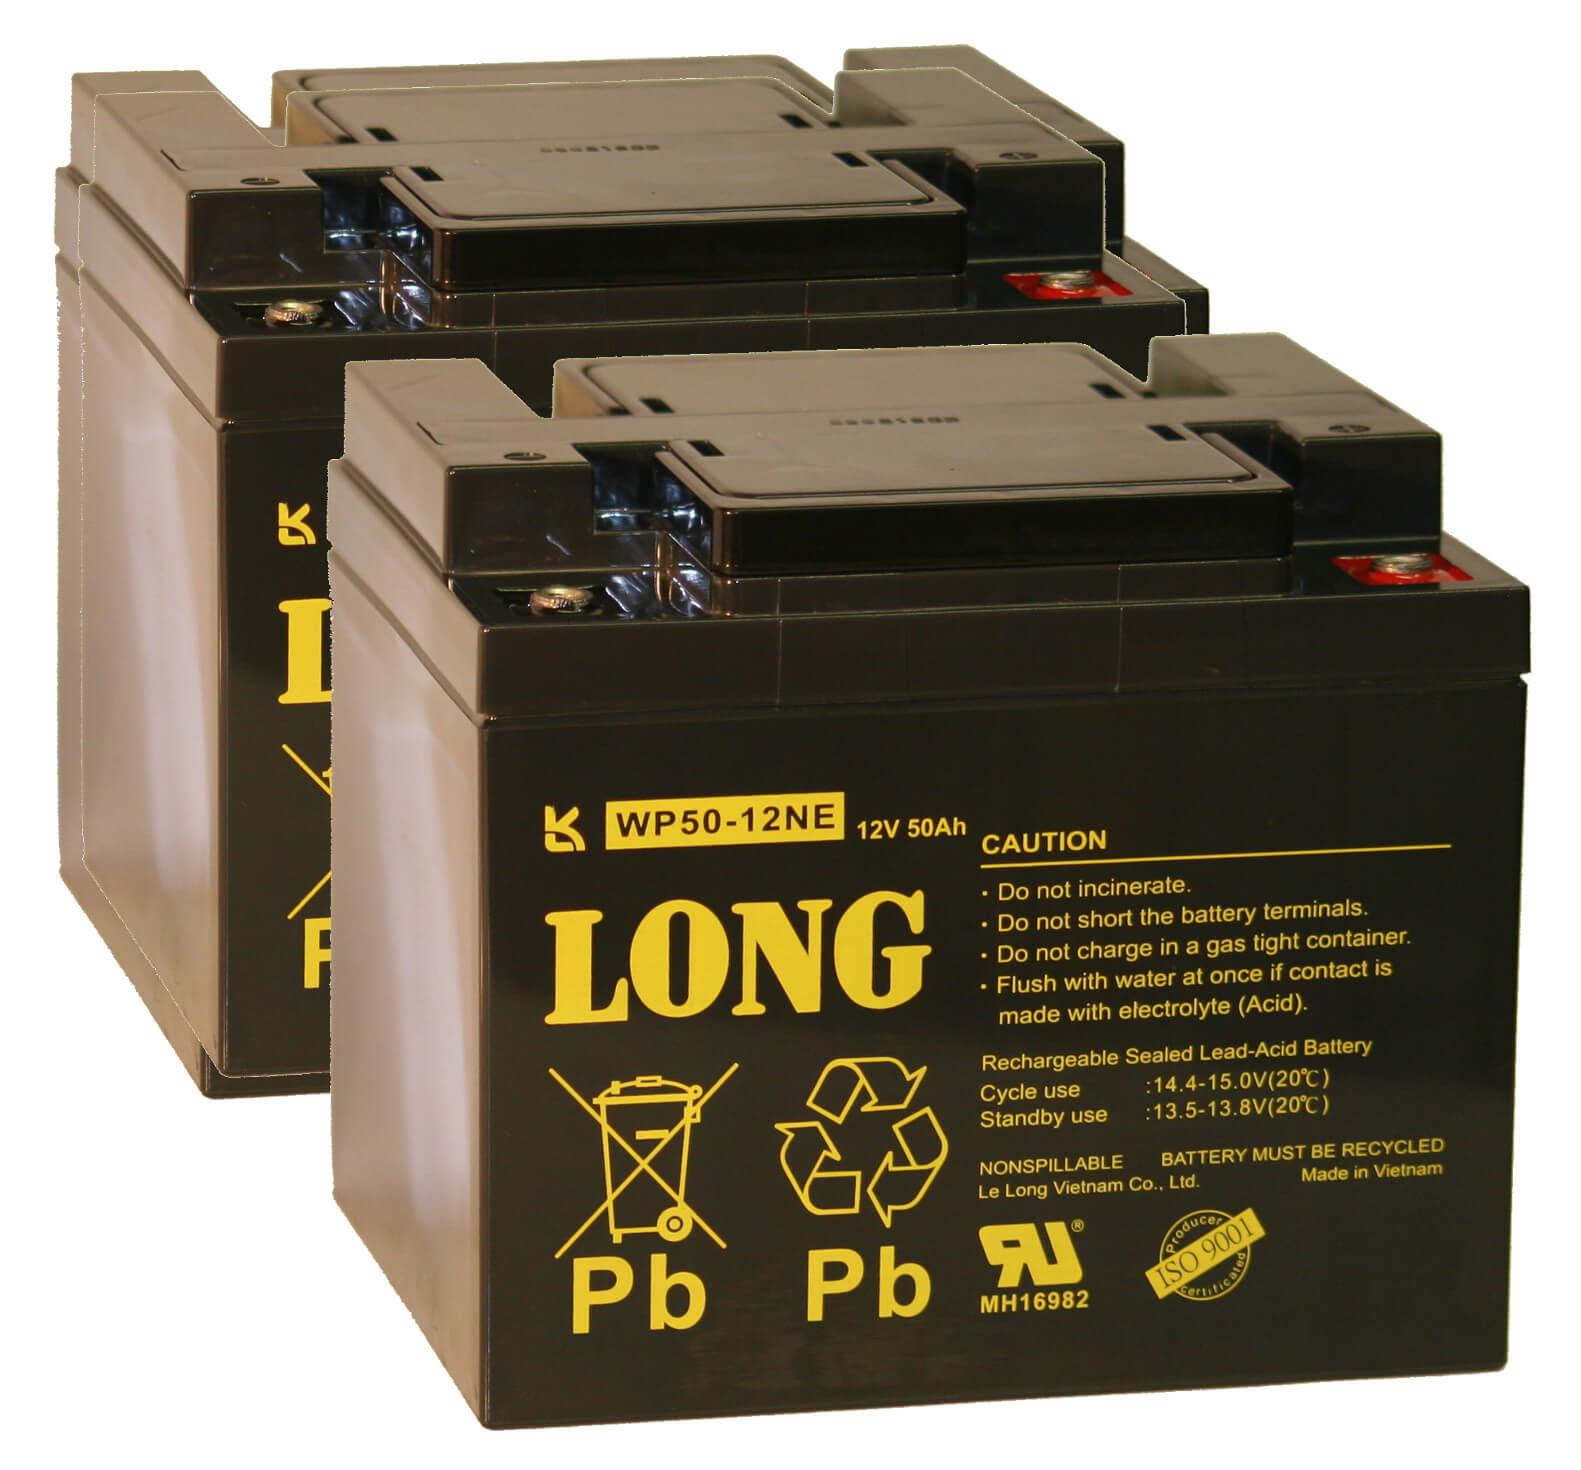 Ersatzbatterie Set für E-Rollstuhl ORTOPEDIA Ortocar 3/4 exklusiv - 2x 12V 50Ah